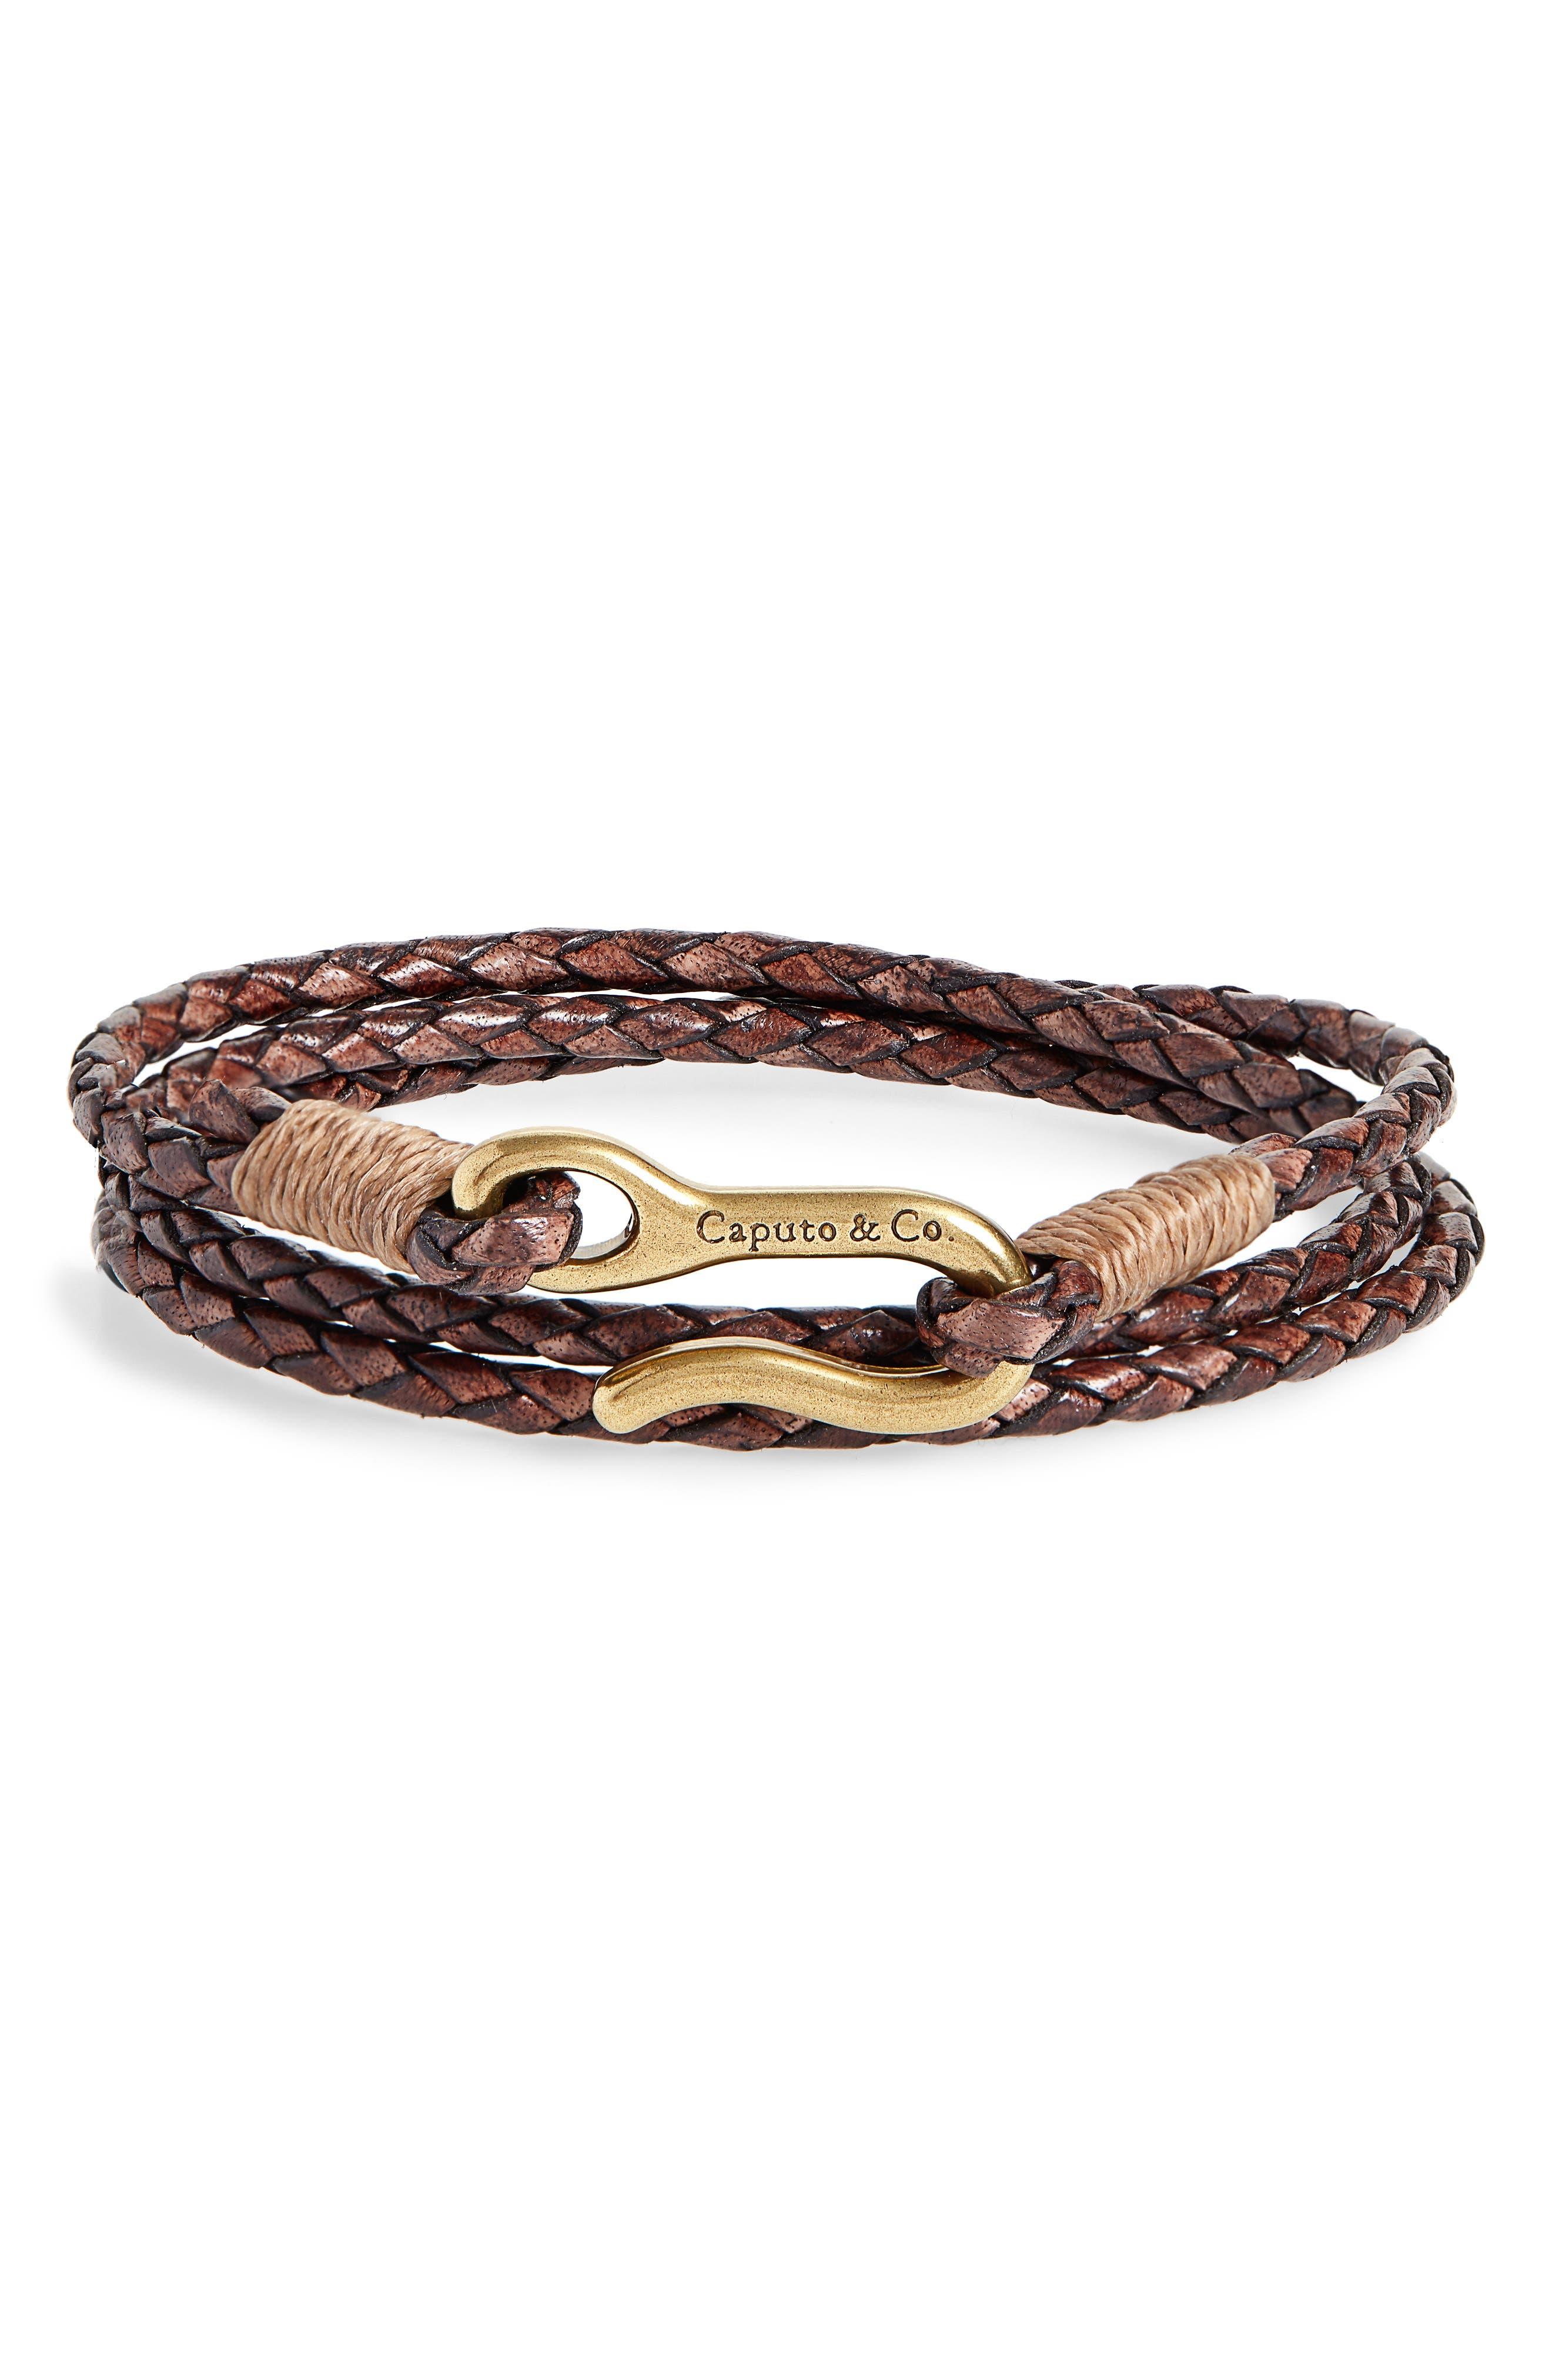 CAPUTO & CO. Braided Leather Wrap Bracelet in Antique Dark Brown